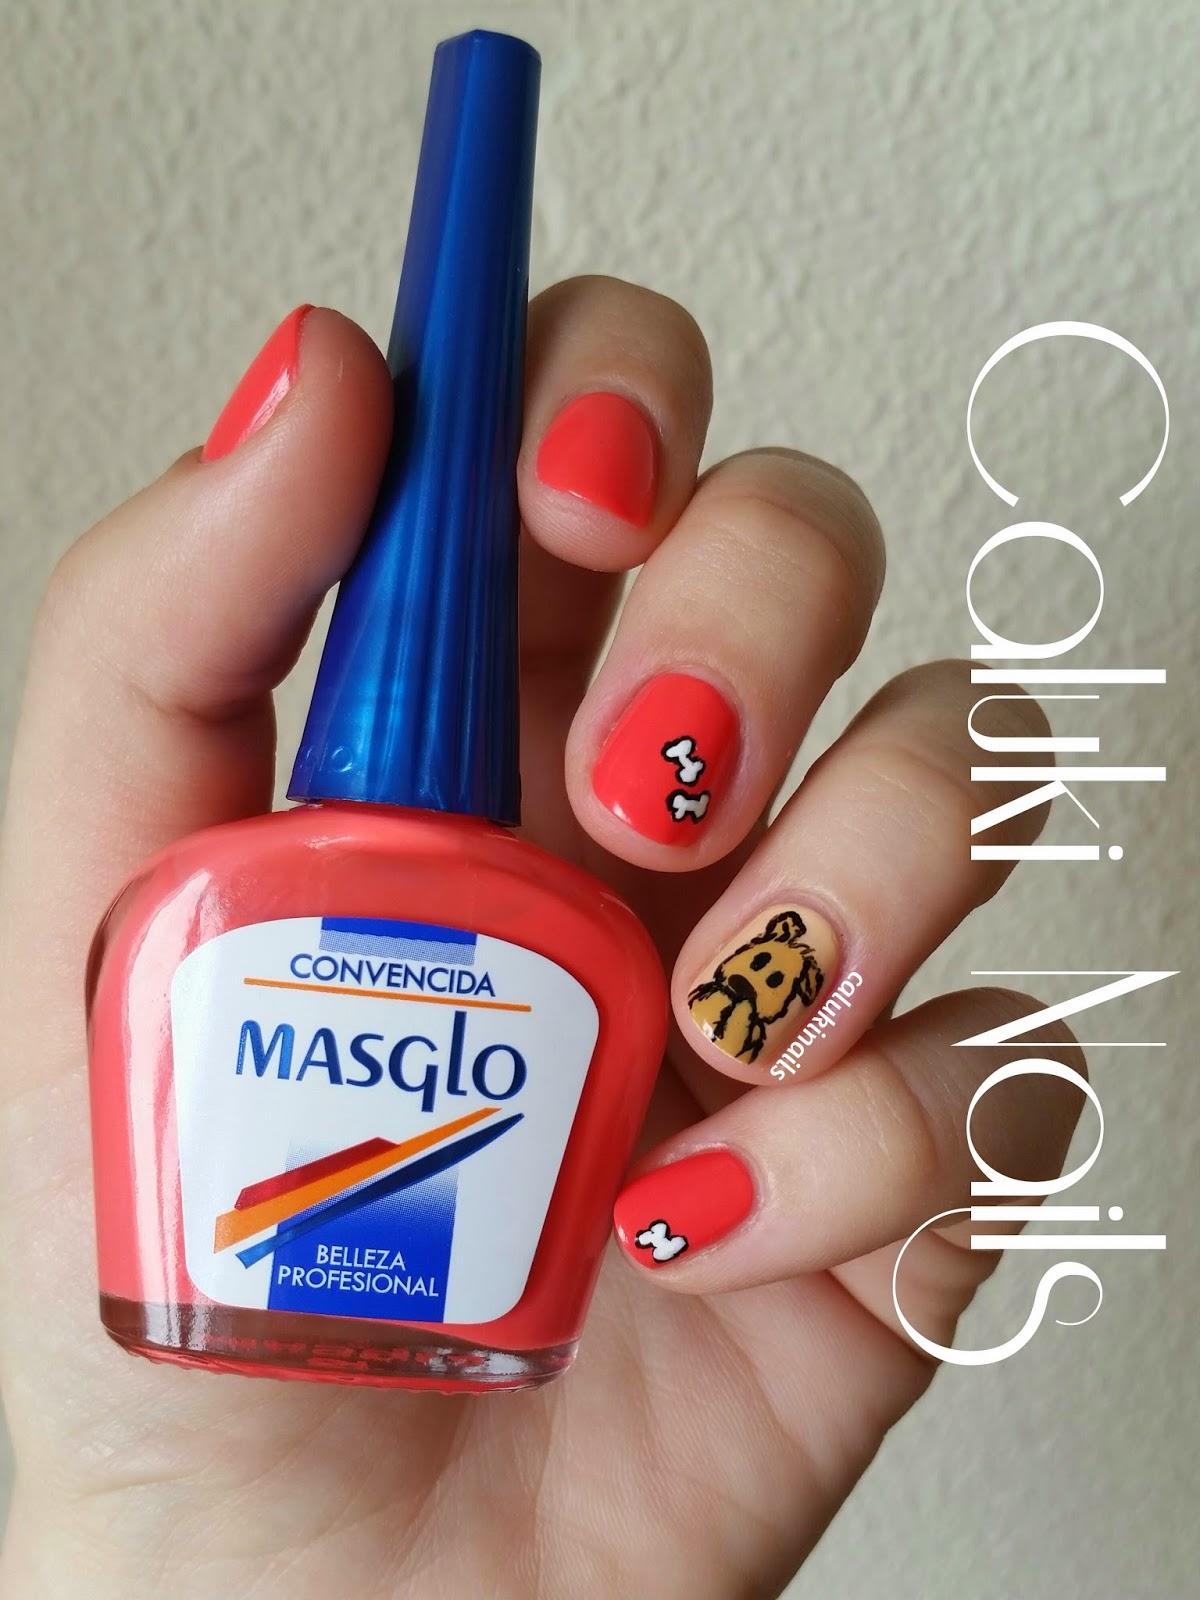 Caluki Nails Nail Art Perrete Convencida Masglo